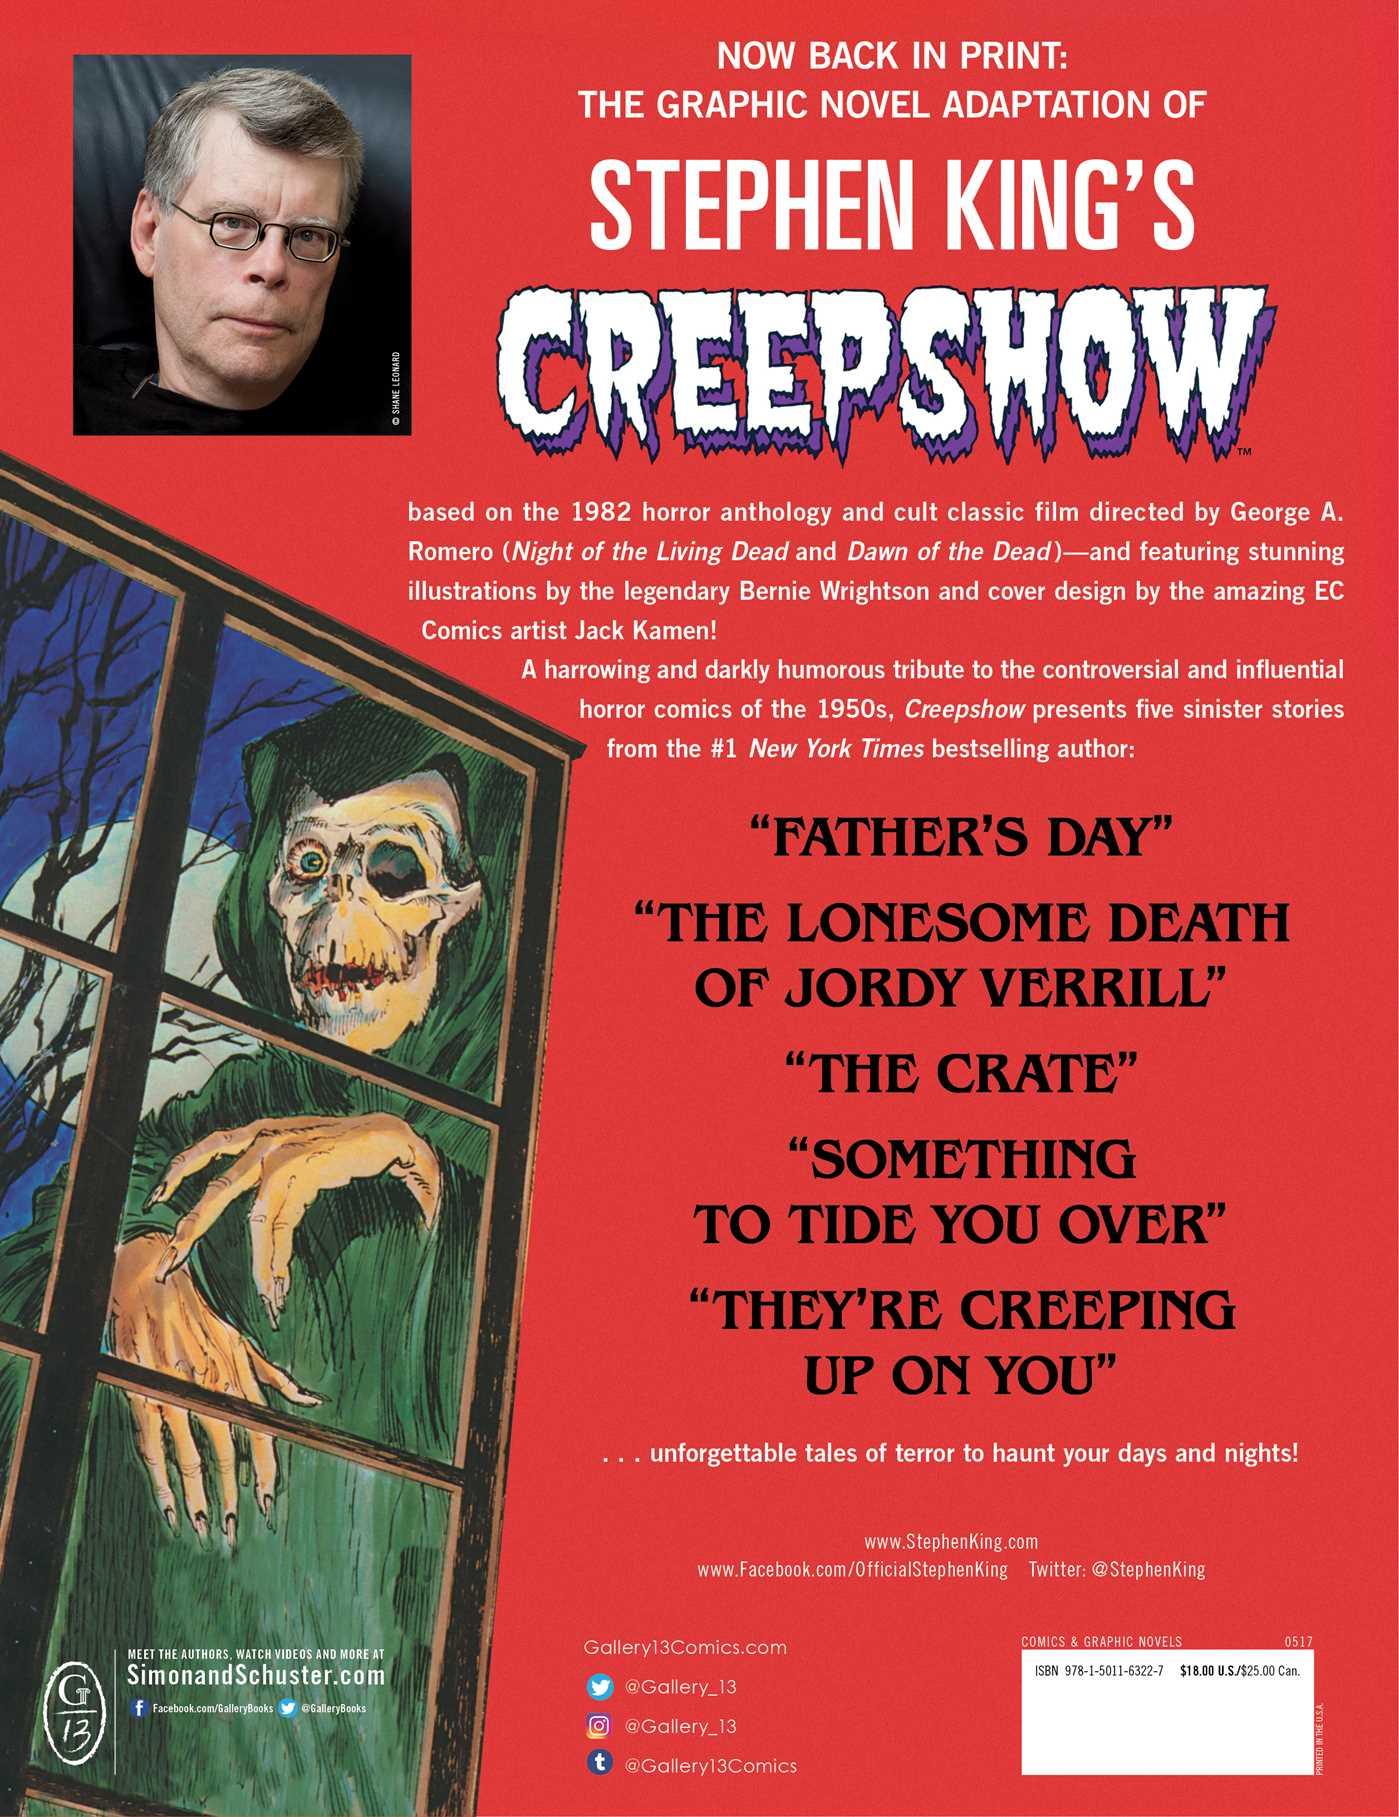 Creepshow 9781501163227 hr back